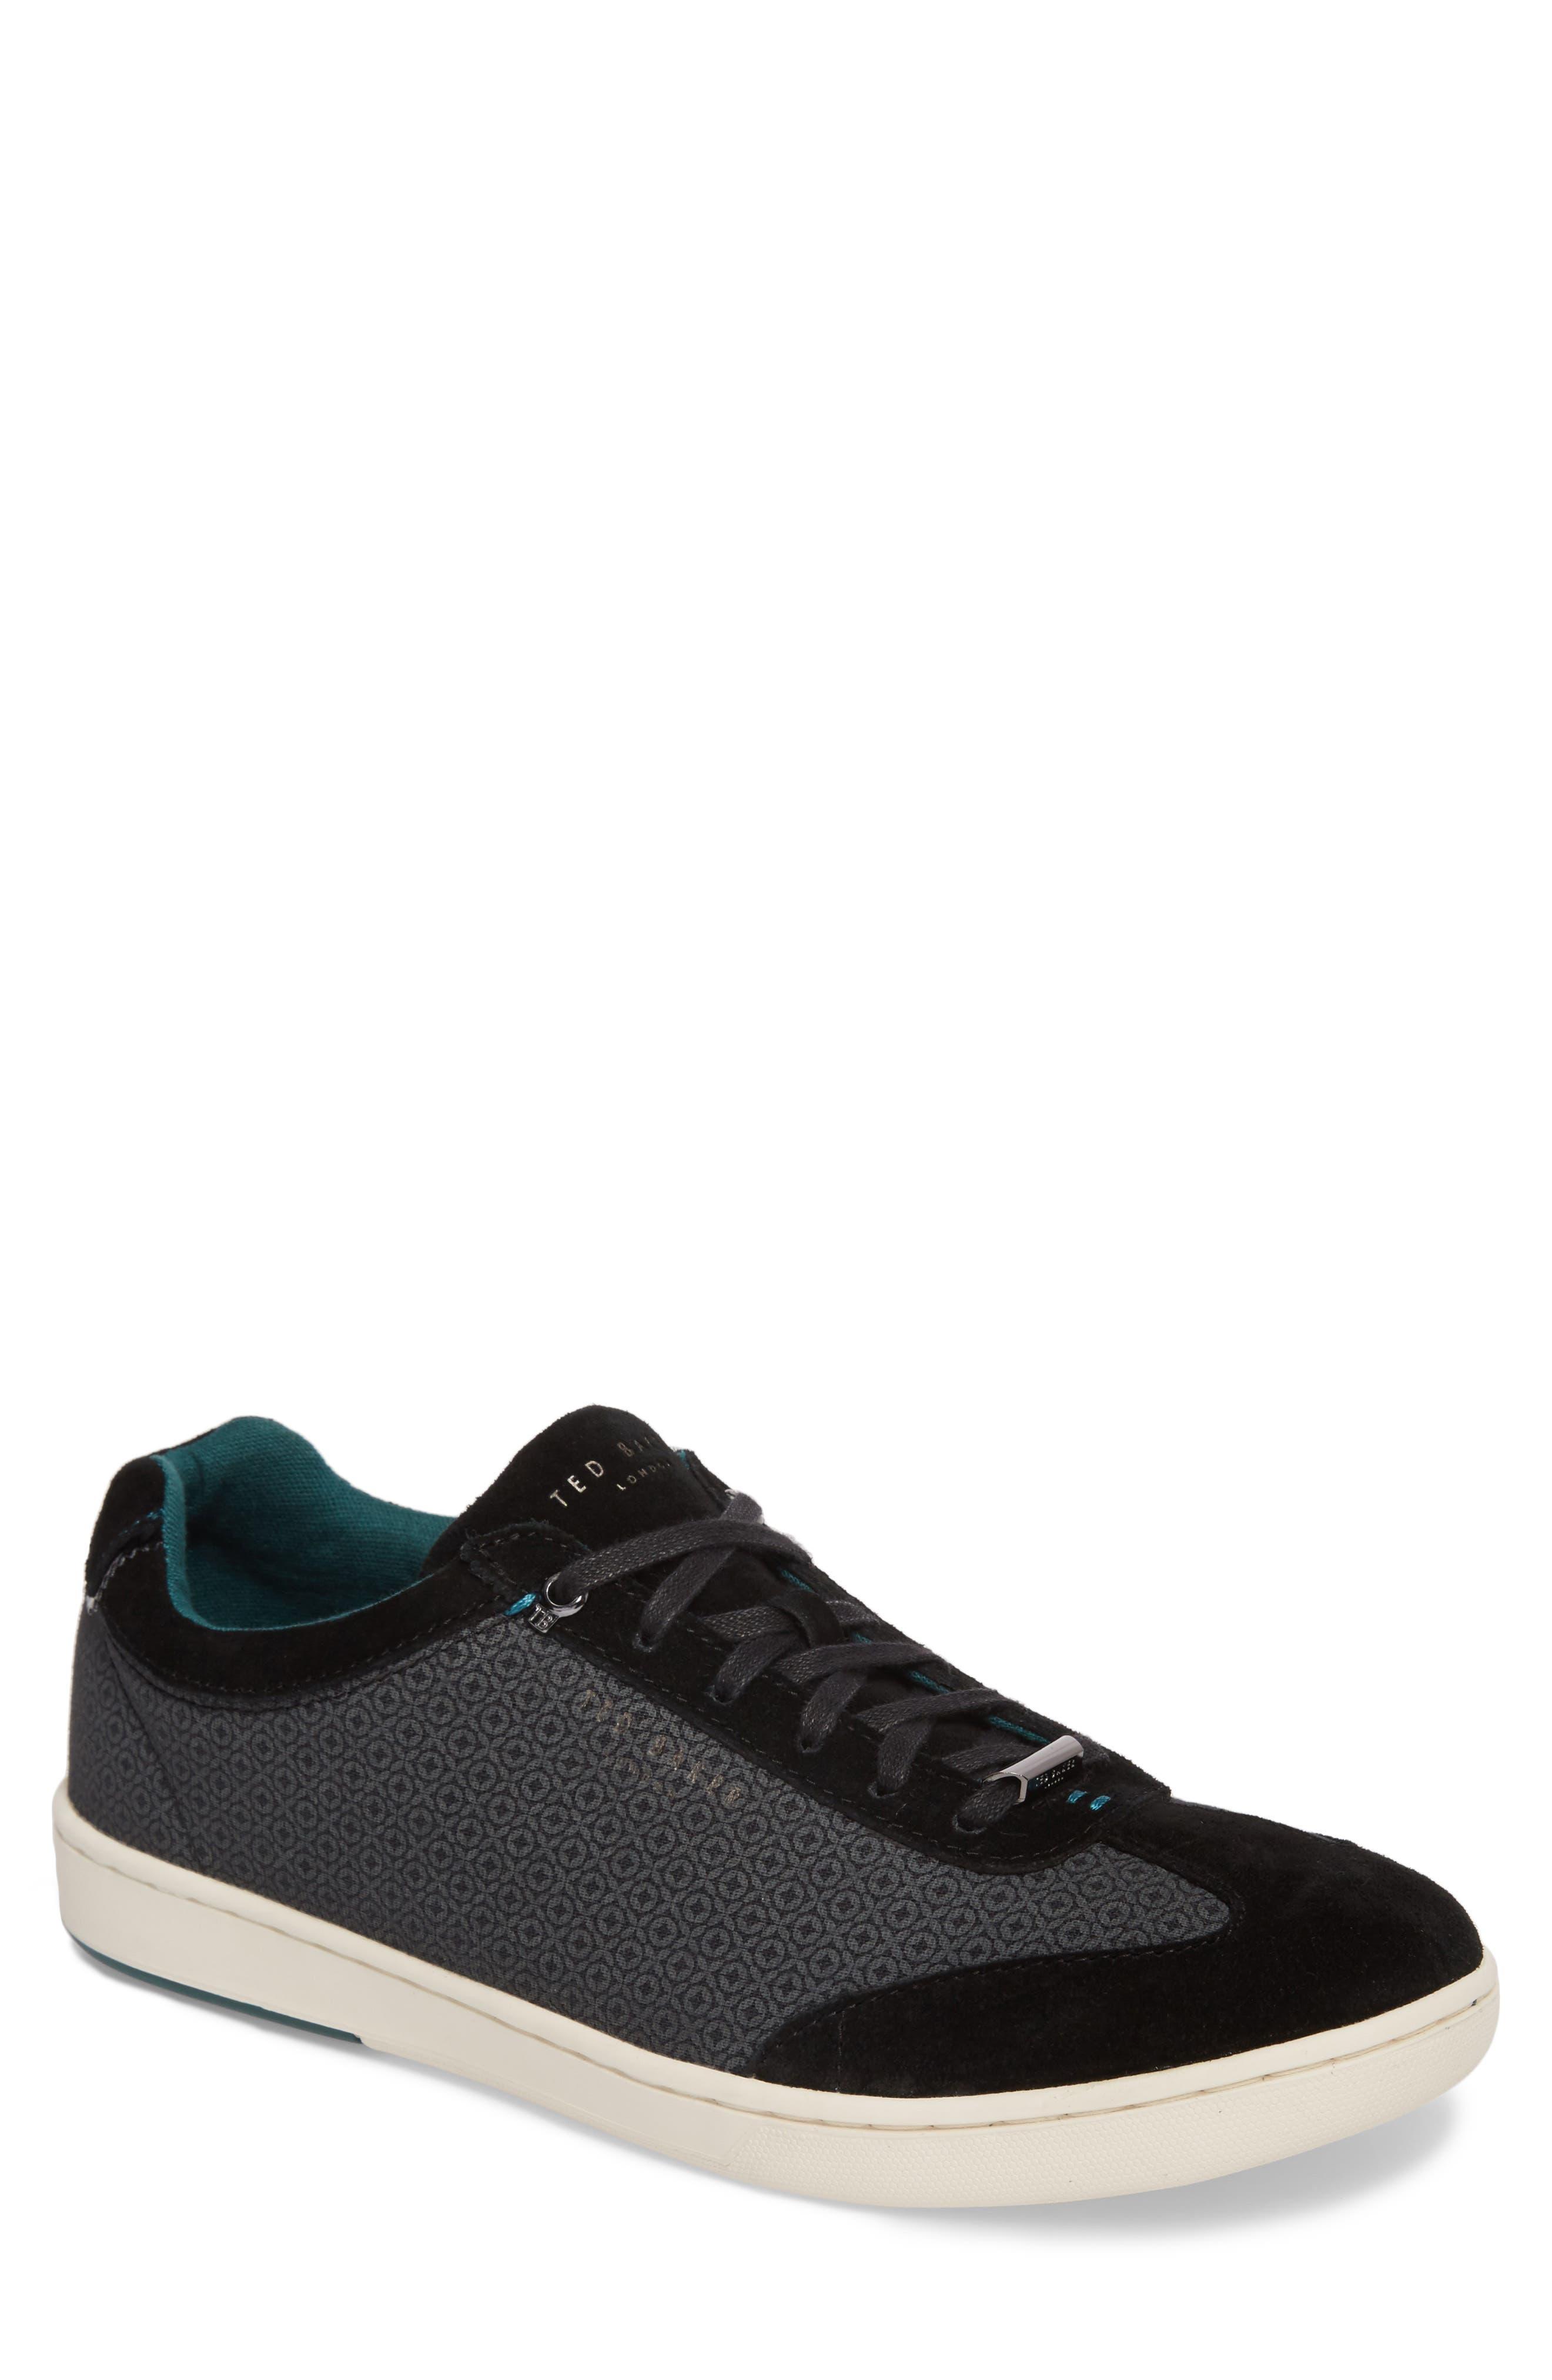 Kiefer Sneaker,                         Main,                         color, Black Suede